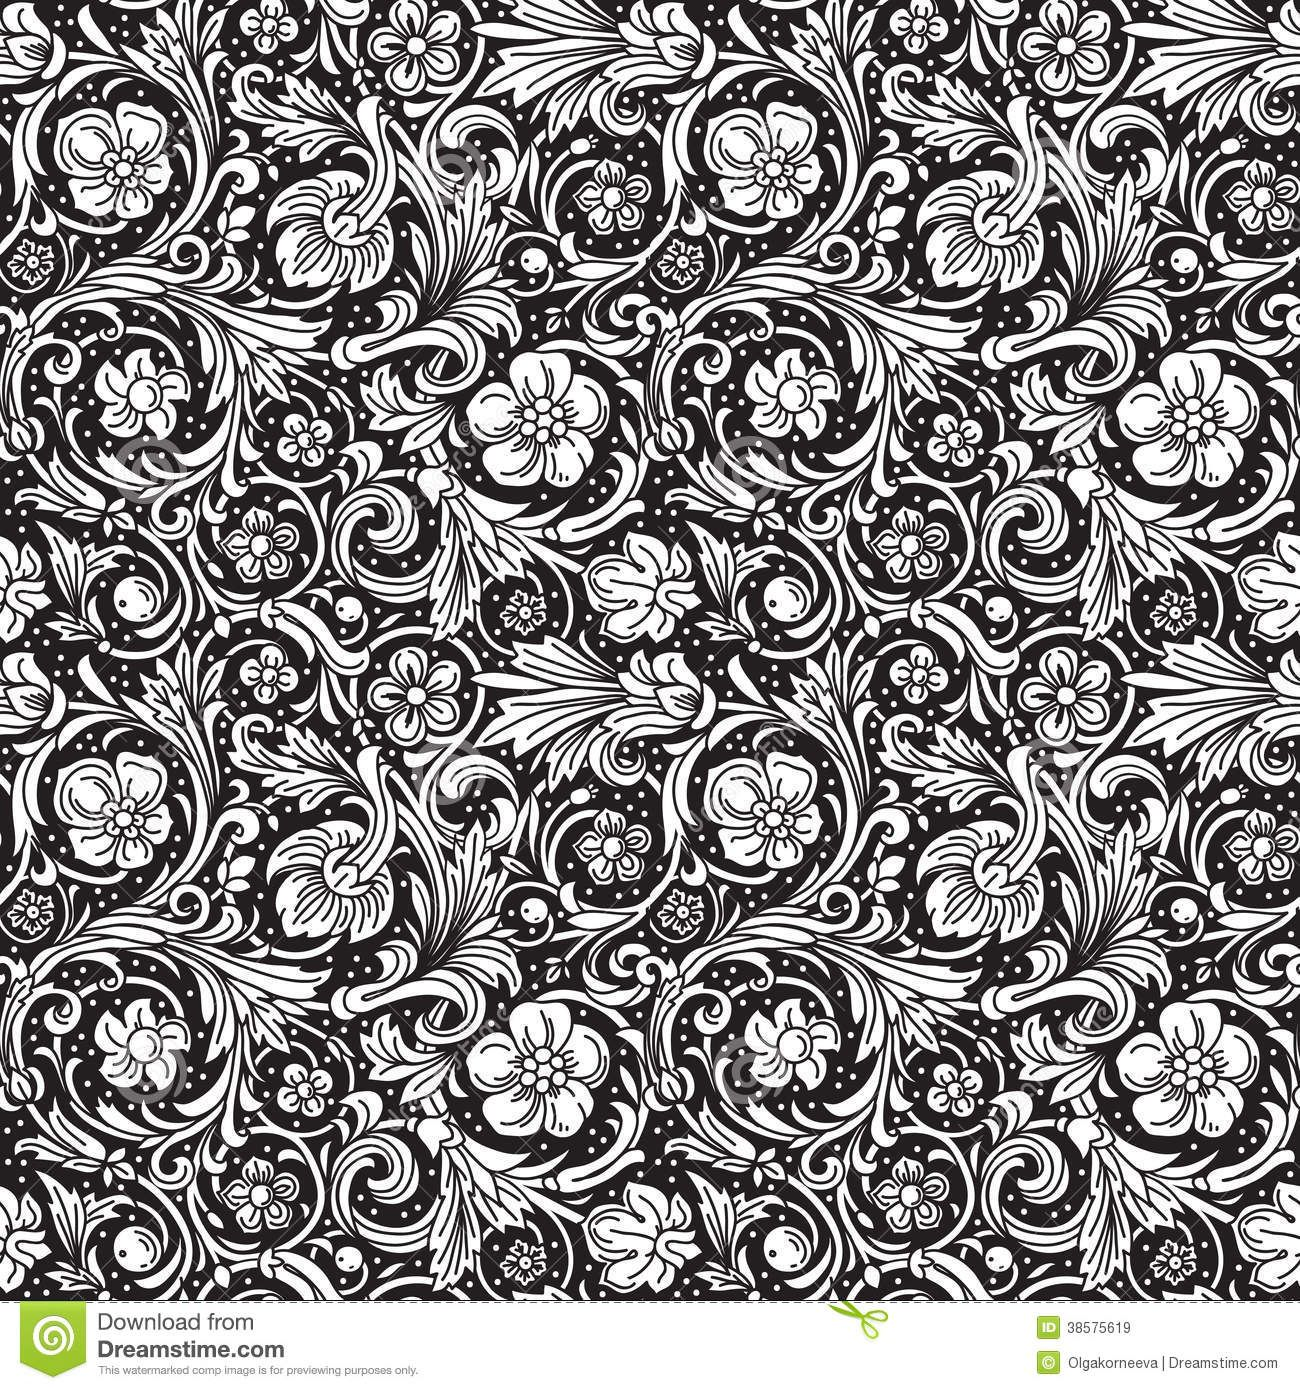 Black And White Ornamental Seamless Vector Pattern Stock Vector Illustration 38575619 Vector Pattern Black Wall Art Baroque